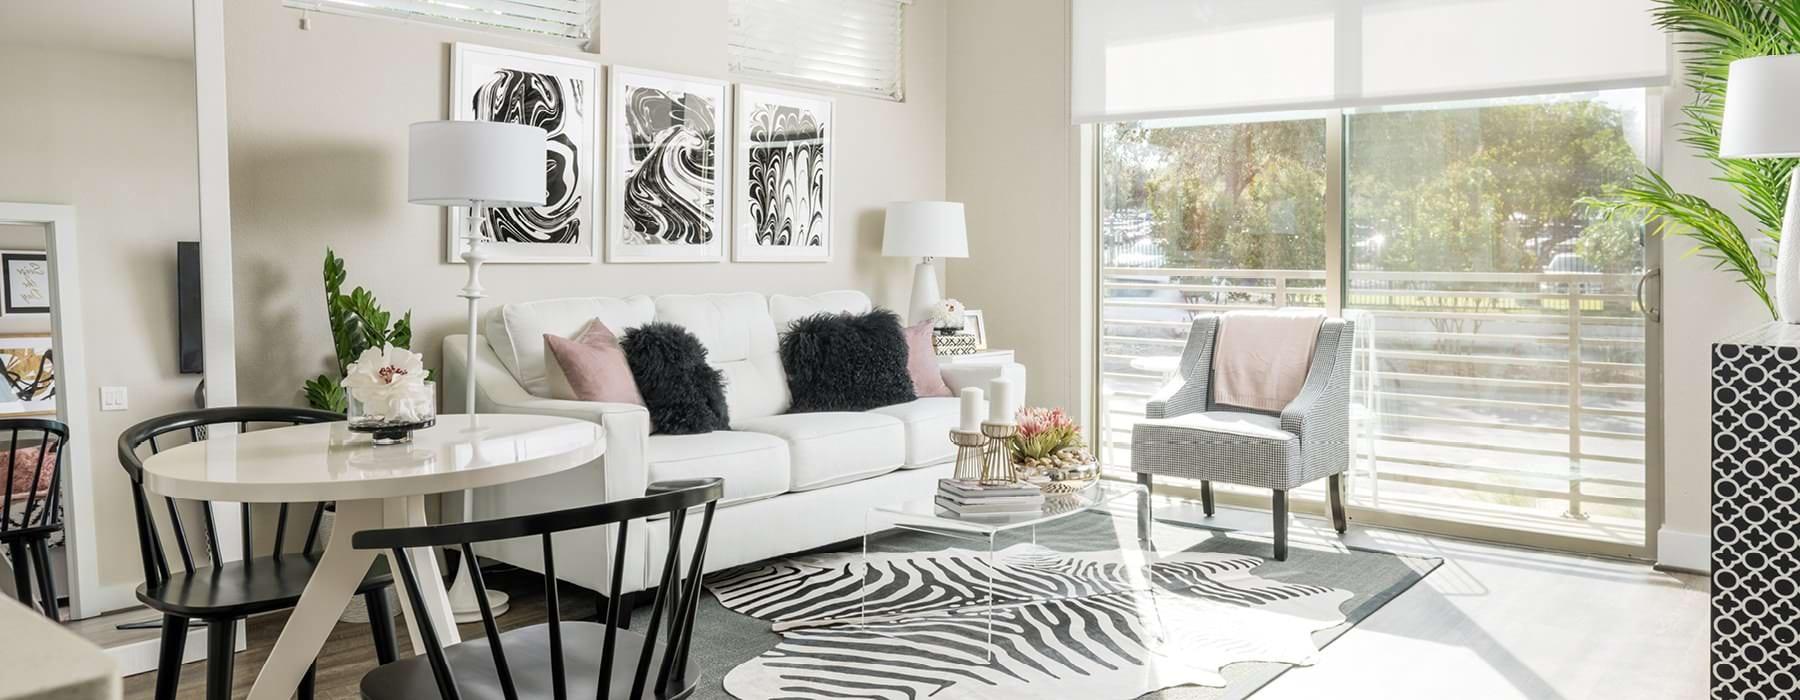 large sliding glass door brightens spacious living room